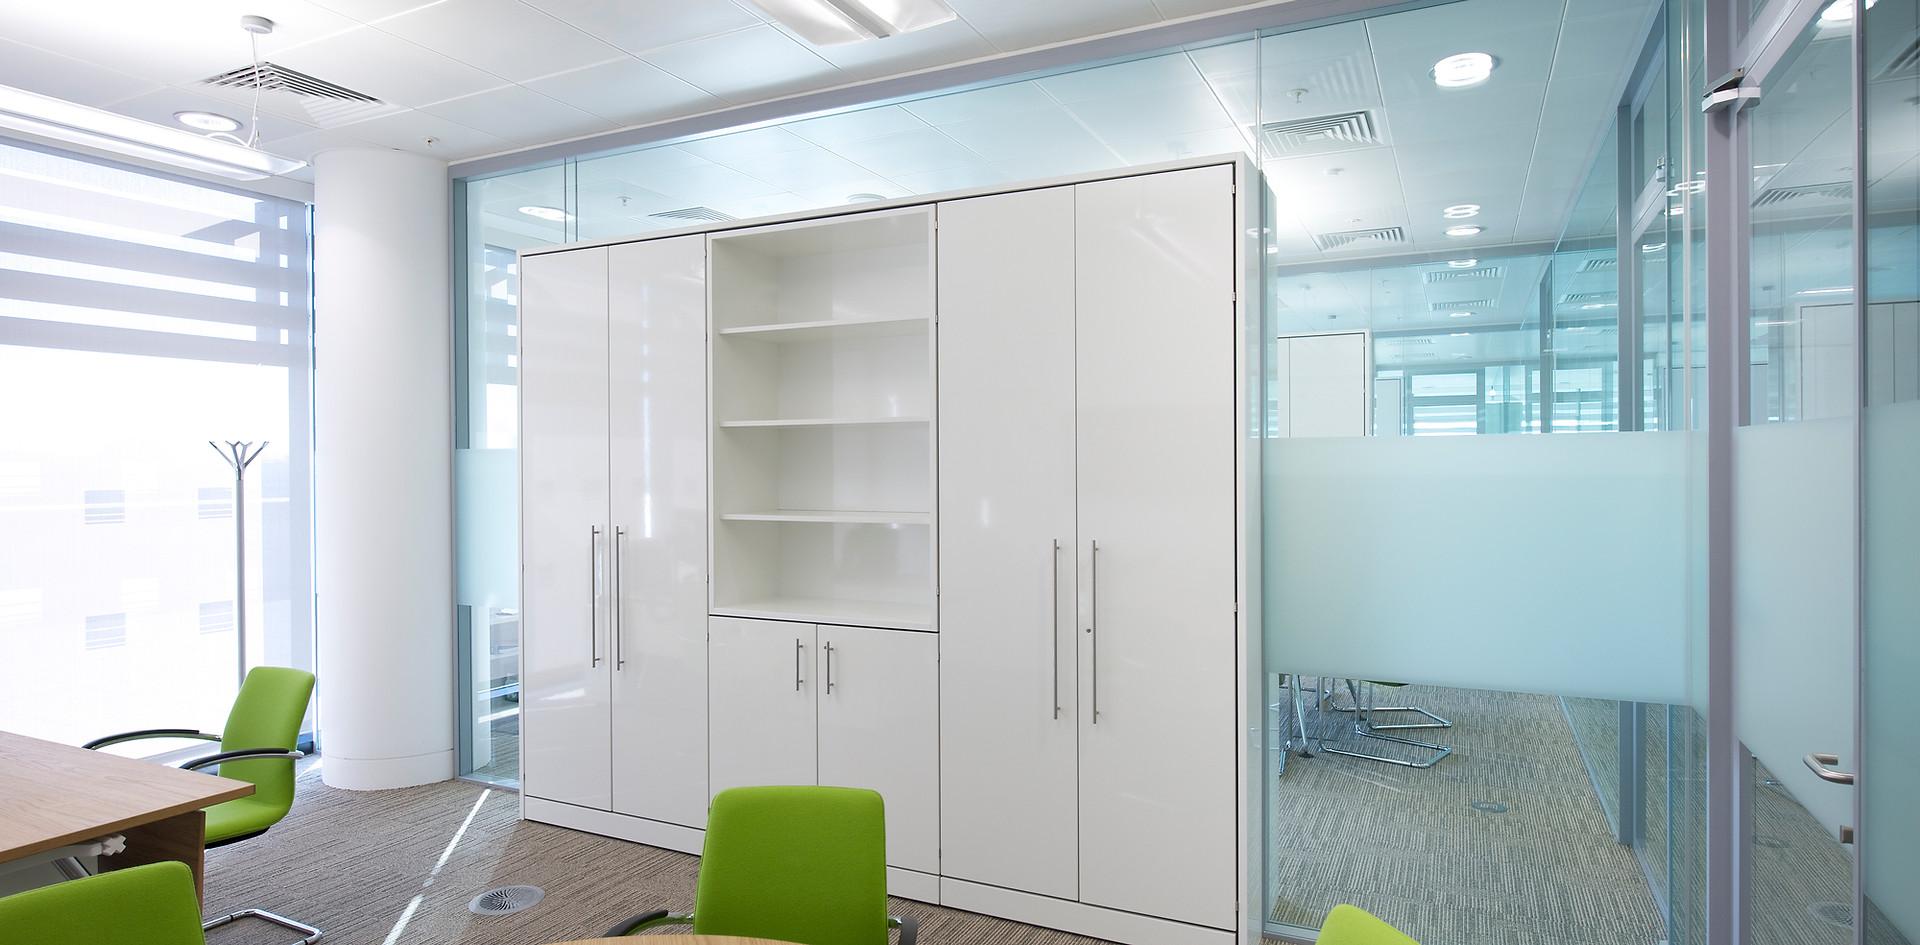 tallwall storage wall office workplace storage open shelving